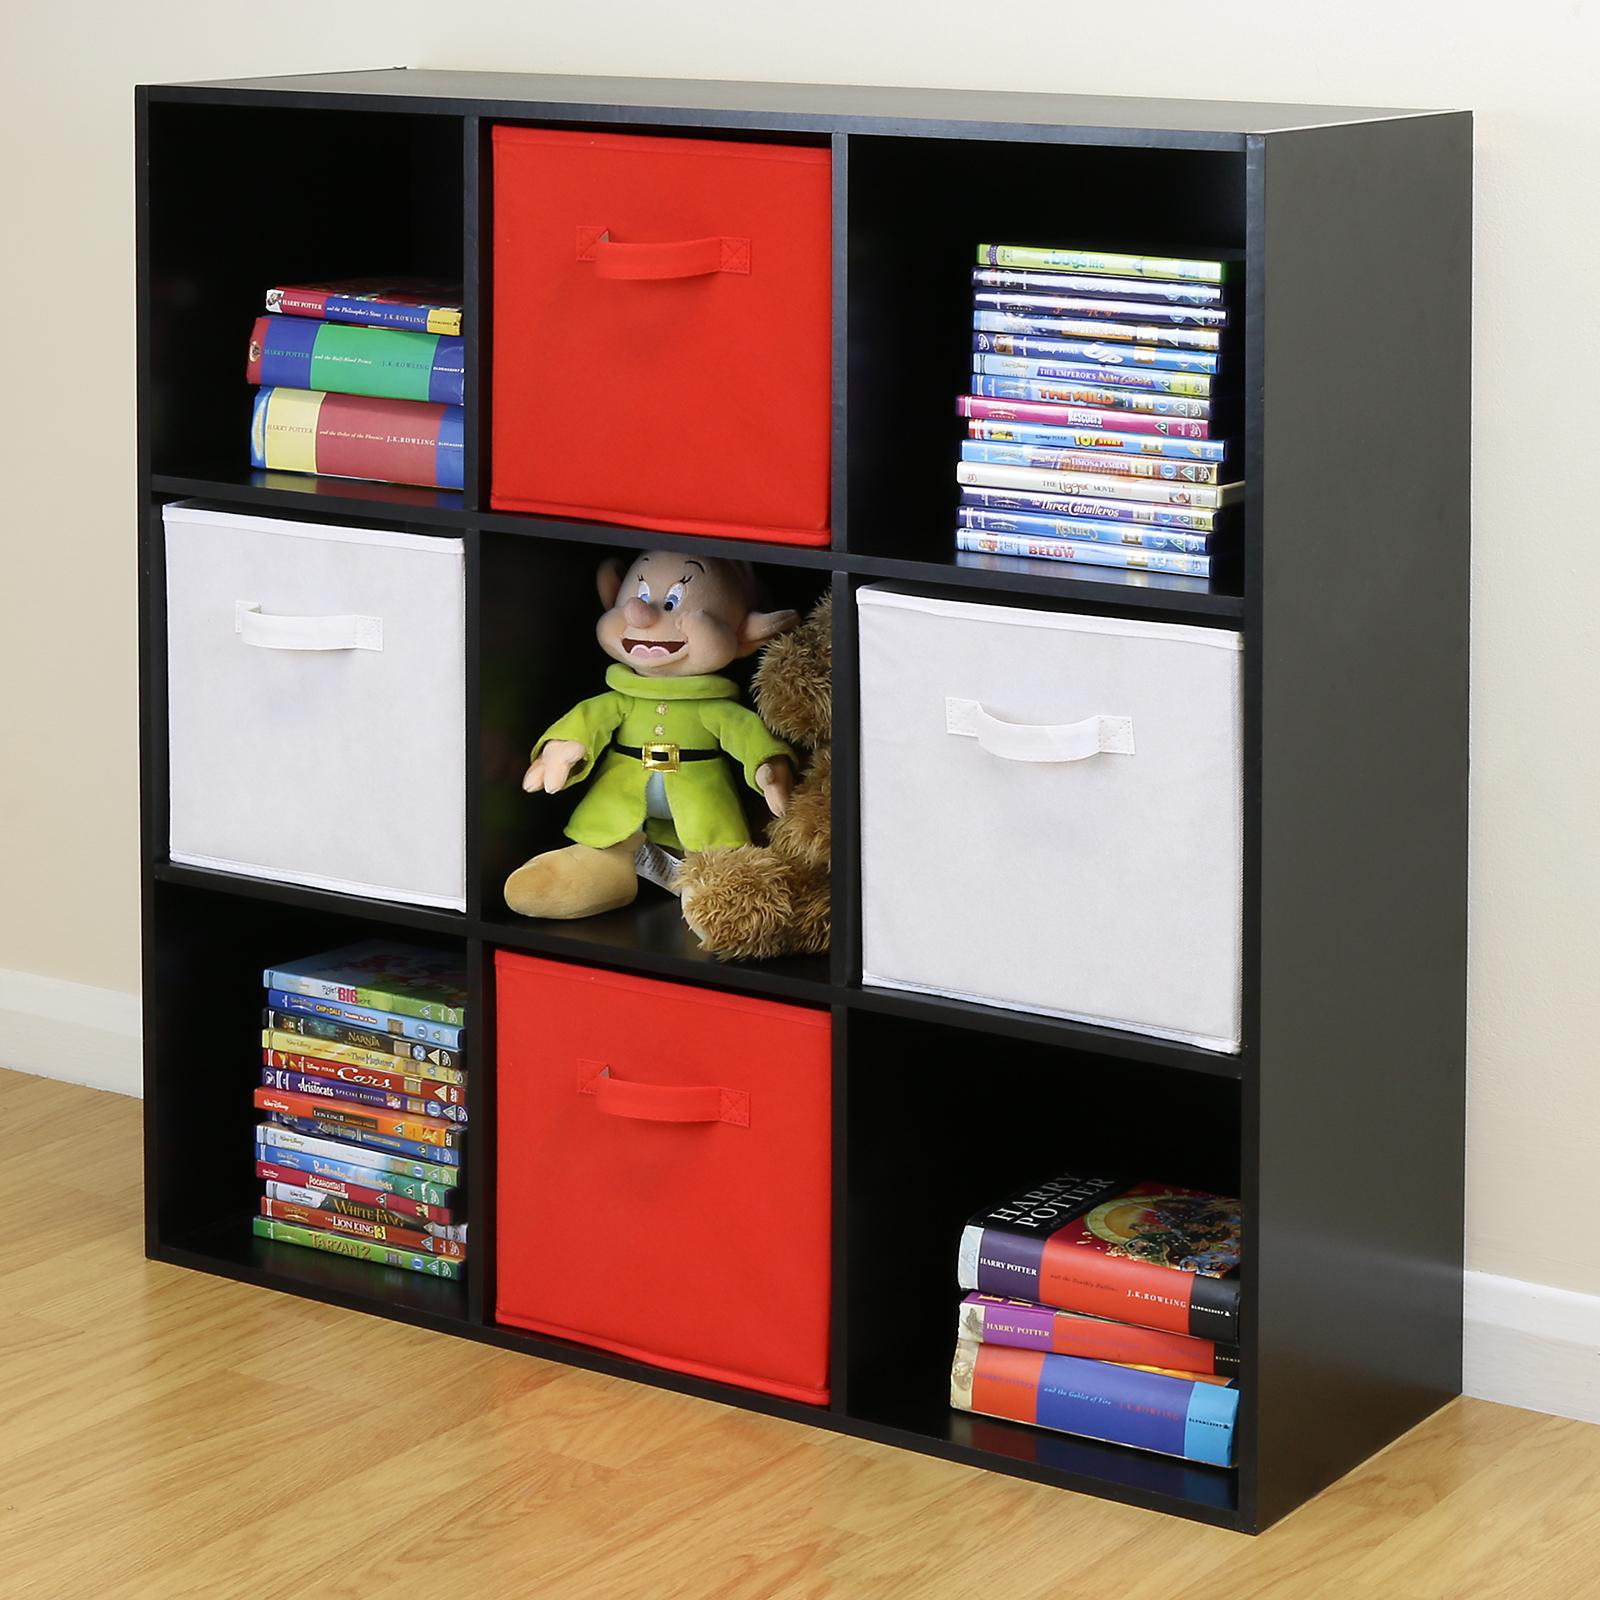 6 Cube Kids White Toy Games Storage Unit Girls Boys Childs: Black 9 Cube Kids Red & White Toy/Games Storage Unit Girls